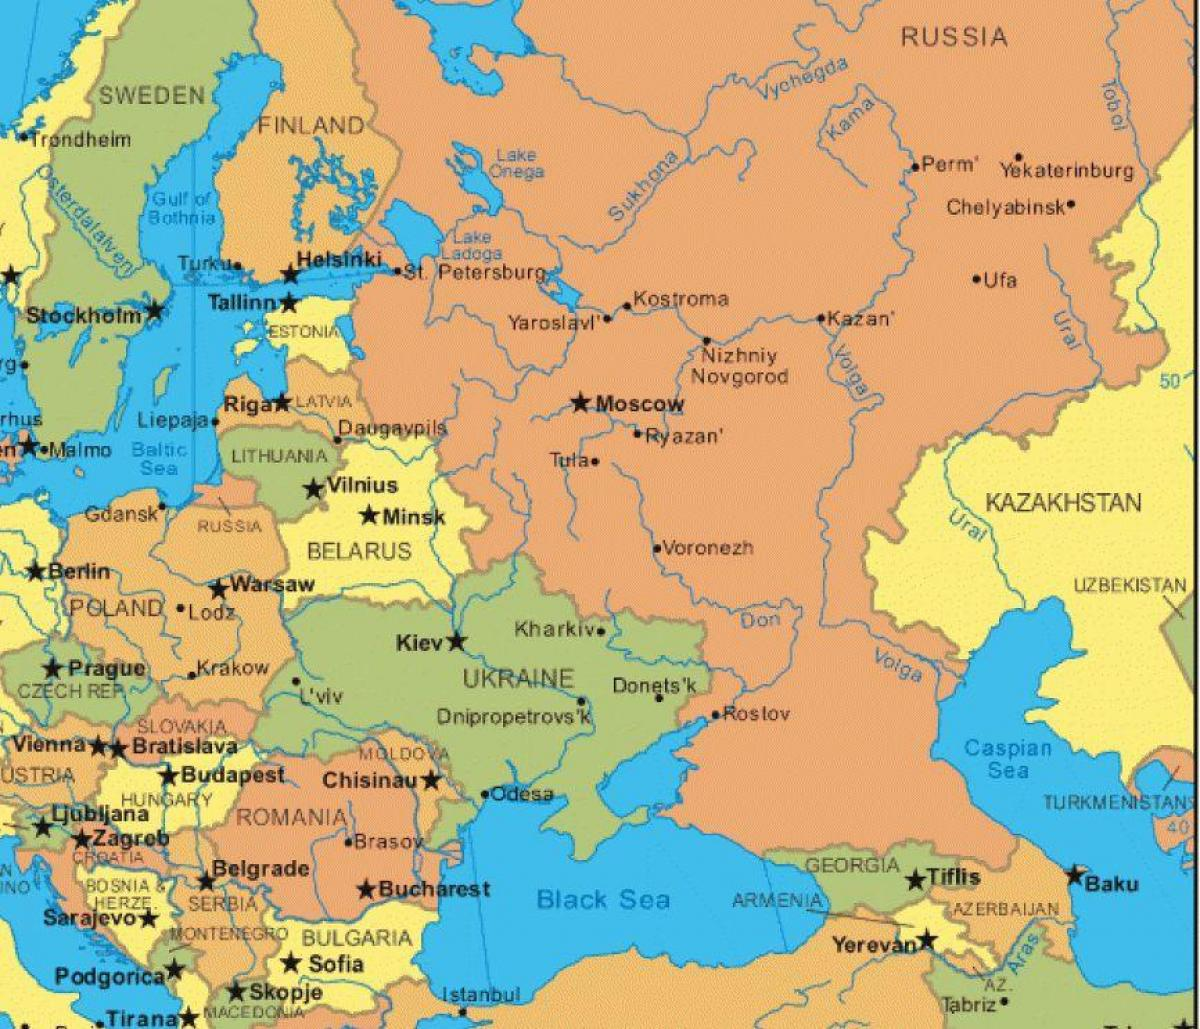 kart over øst europa Kart over øst europa og Russland   Russland og øst europa kart  kart over øst europa